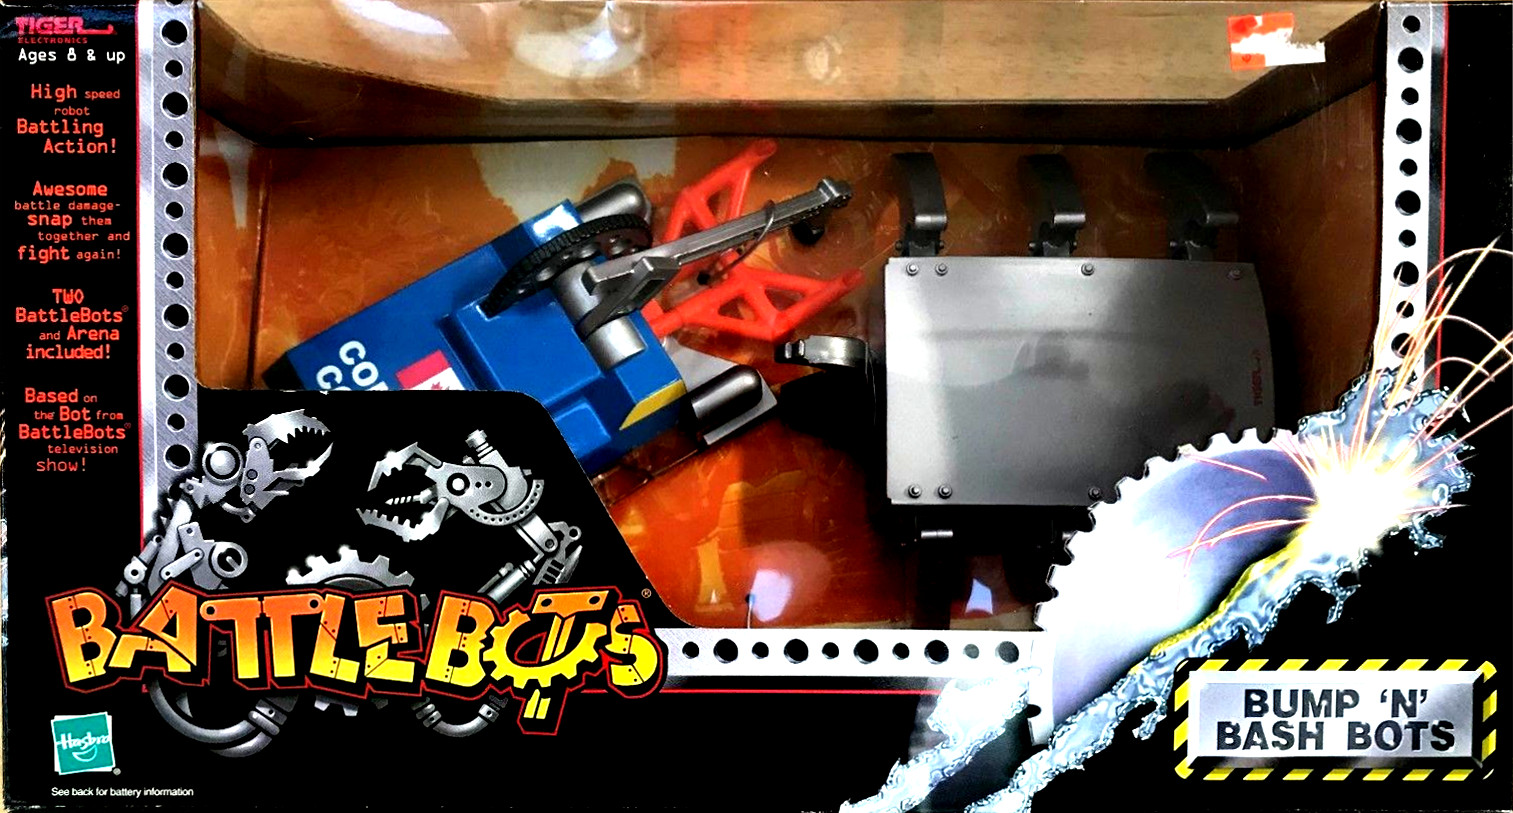 Red Scorpion/Bump N' Bash Bots